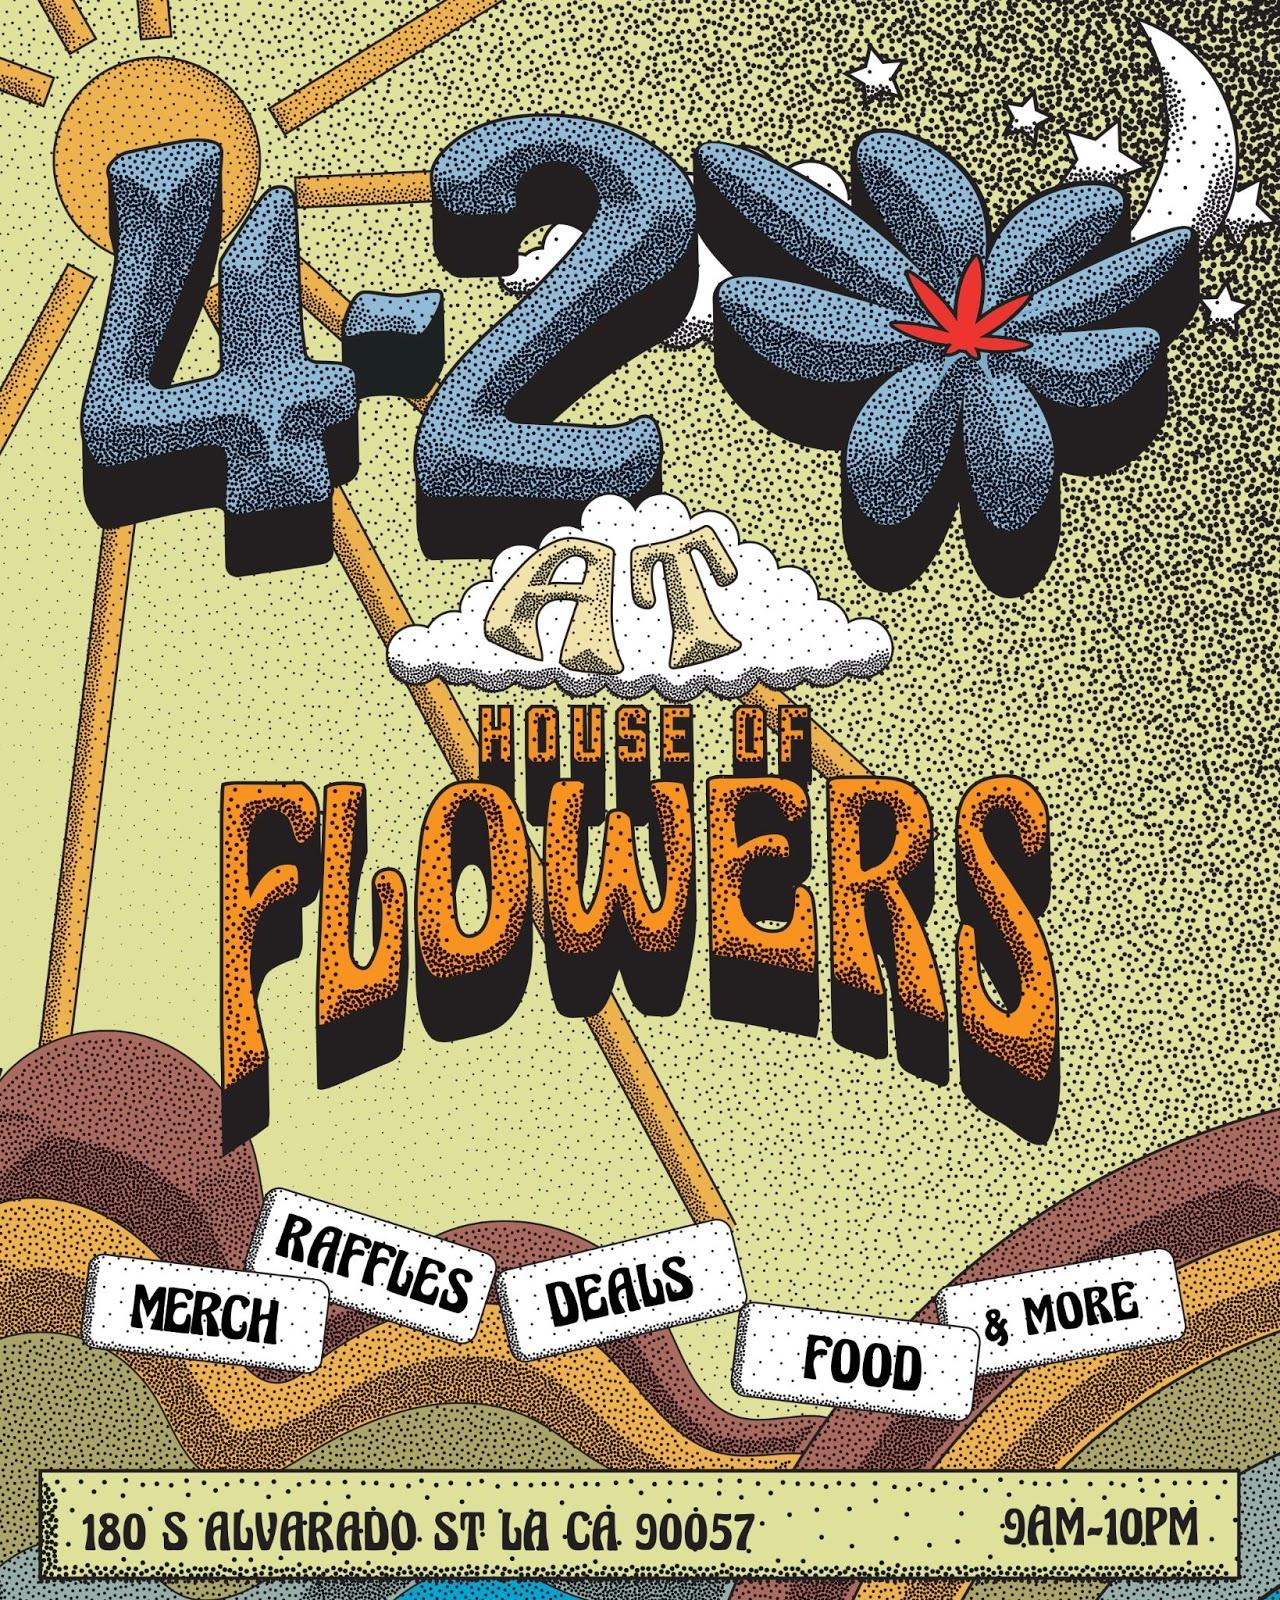 1618596761055_11-house-of-flowers-dispensary-merry-jane-420.JPG